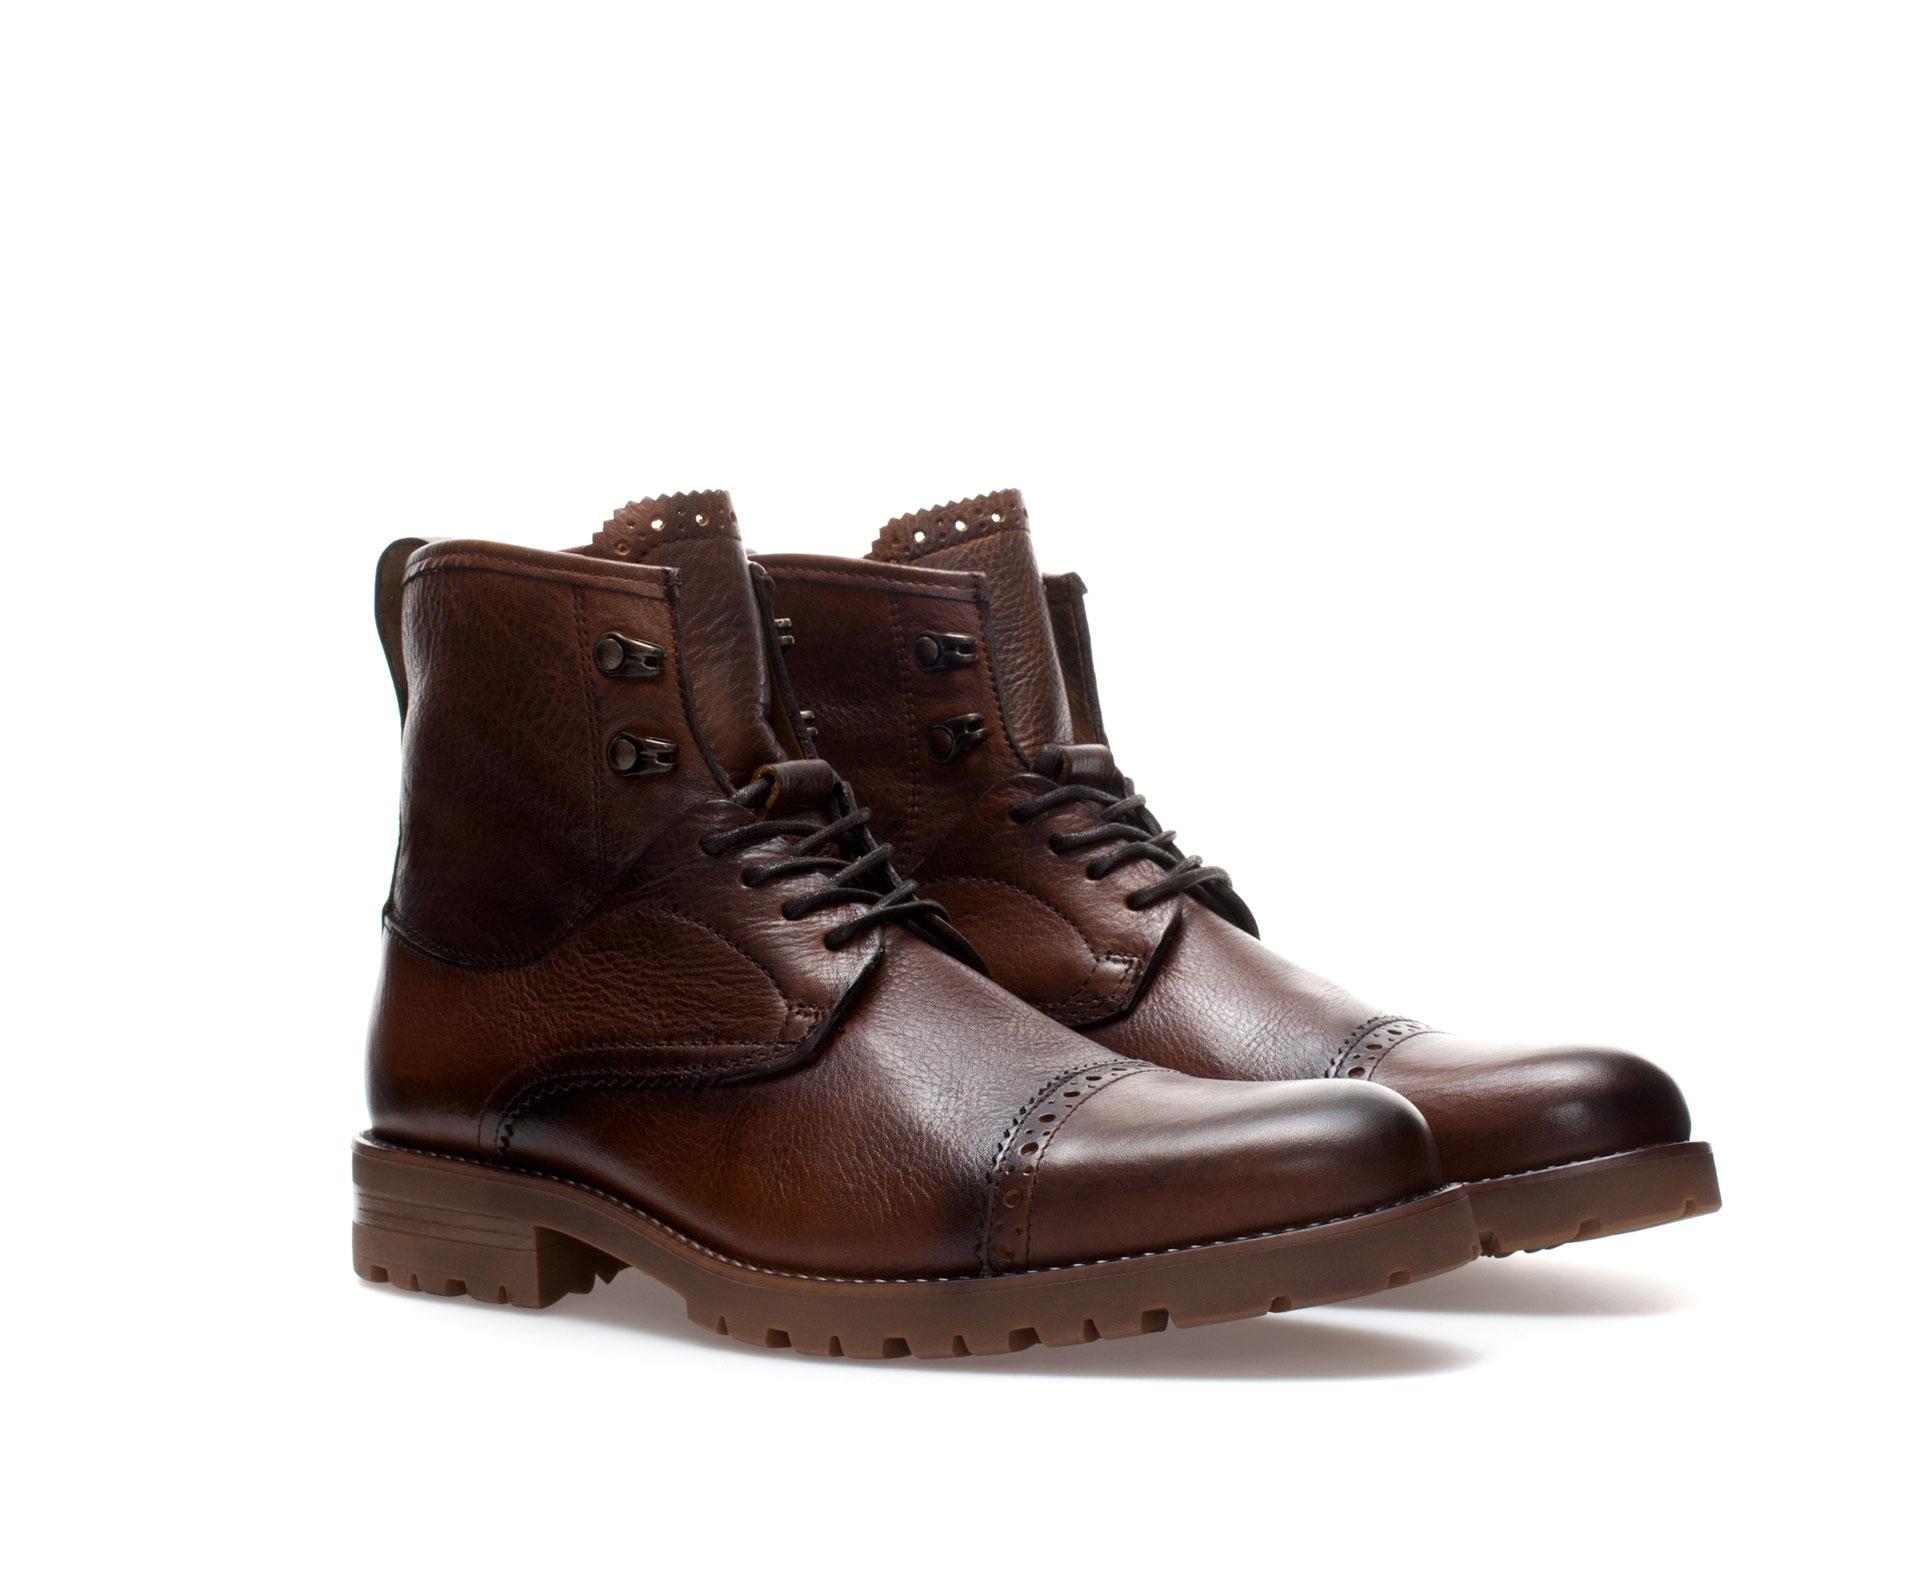 Zara Dress Brogue Boot In Brown For Men Lyst